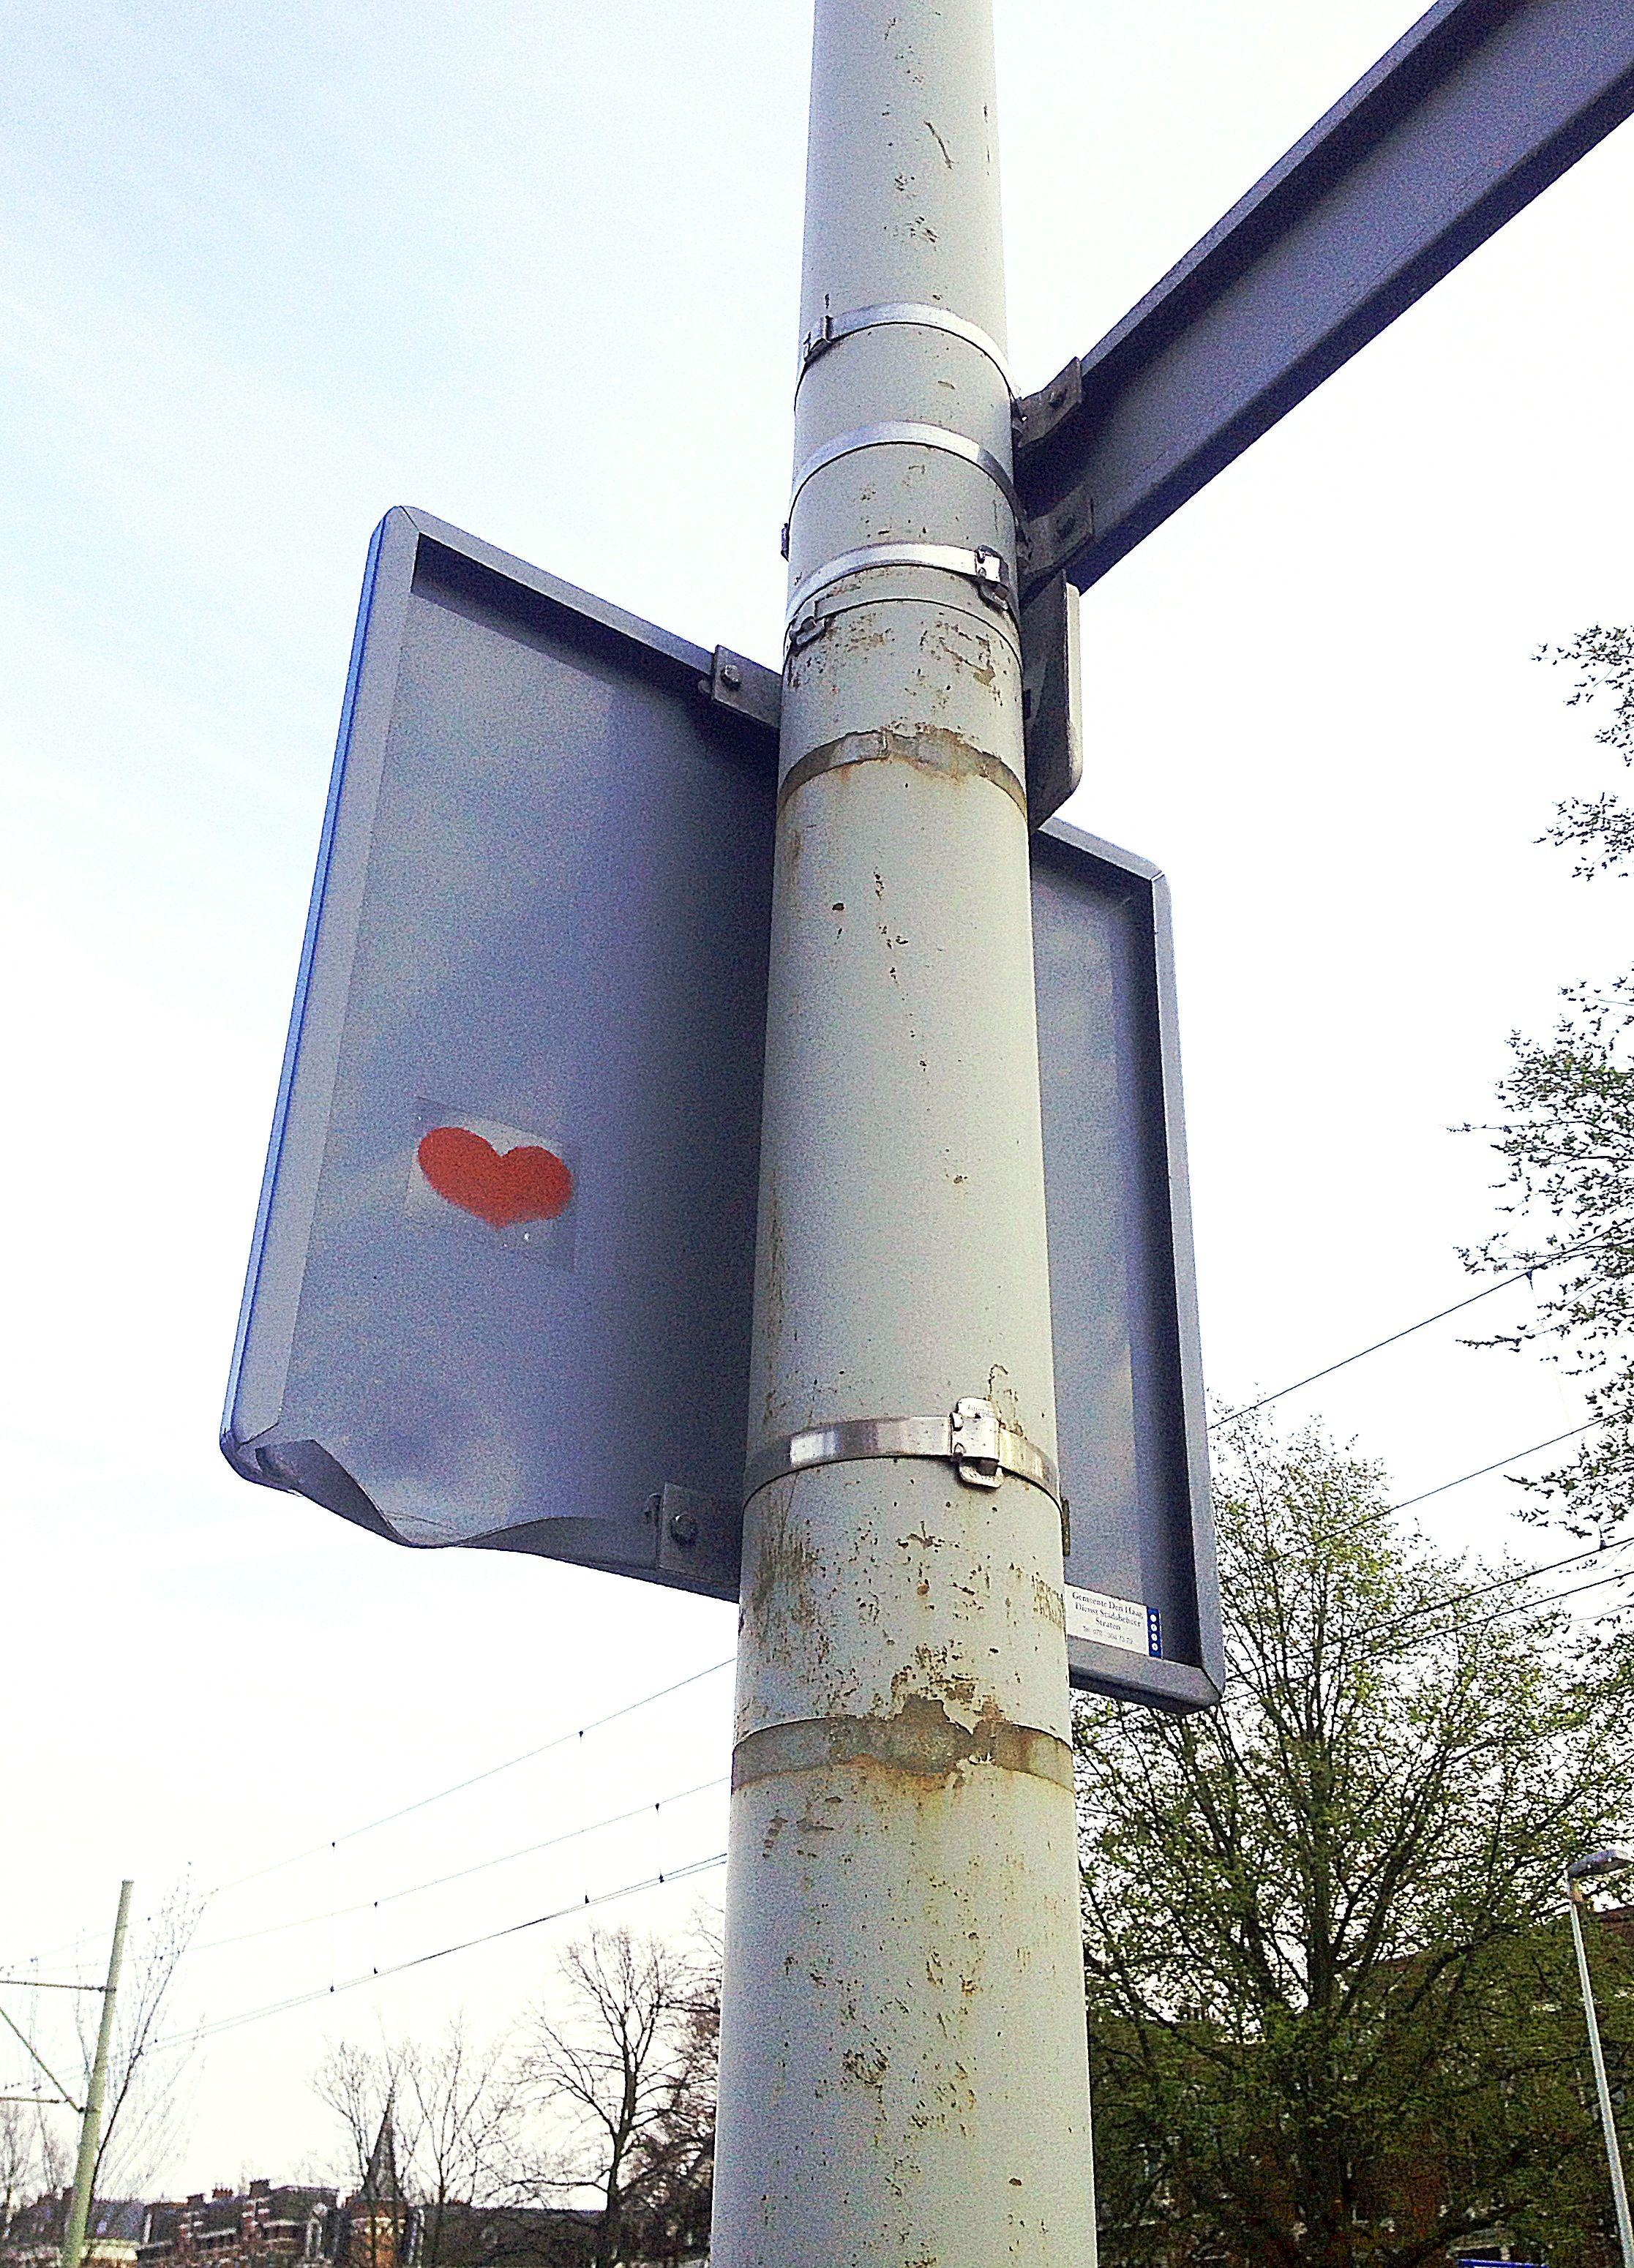 #heartshaped sticker